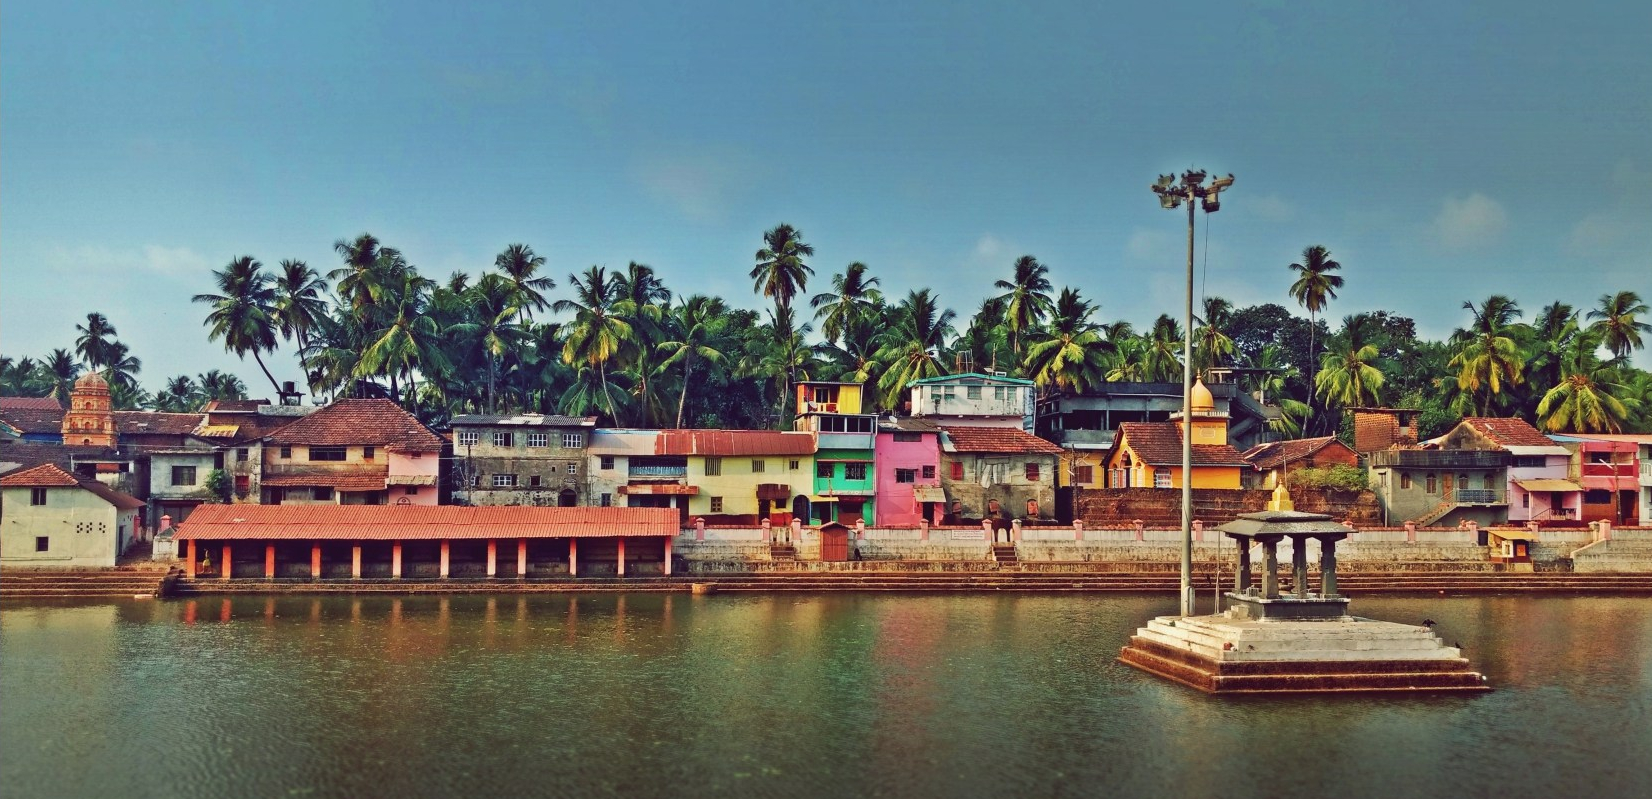 gokarna karnataka blog nomadographer